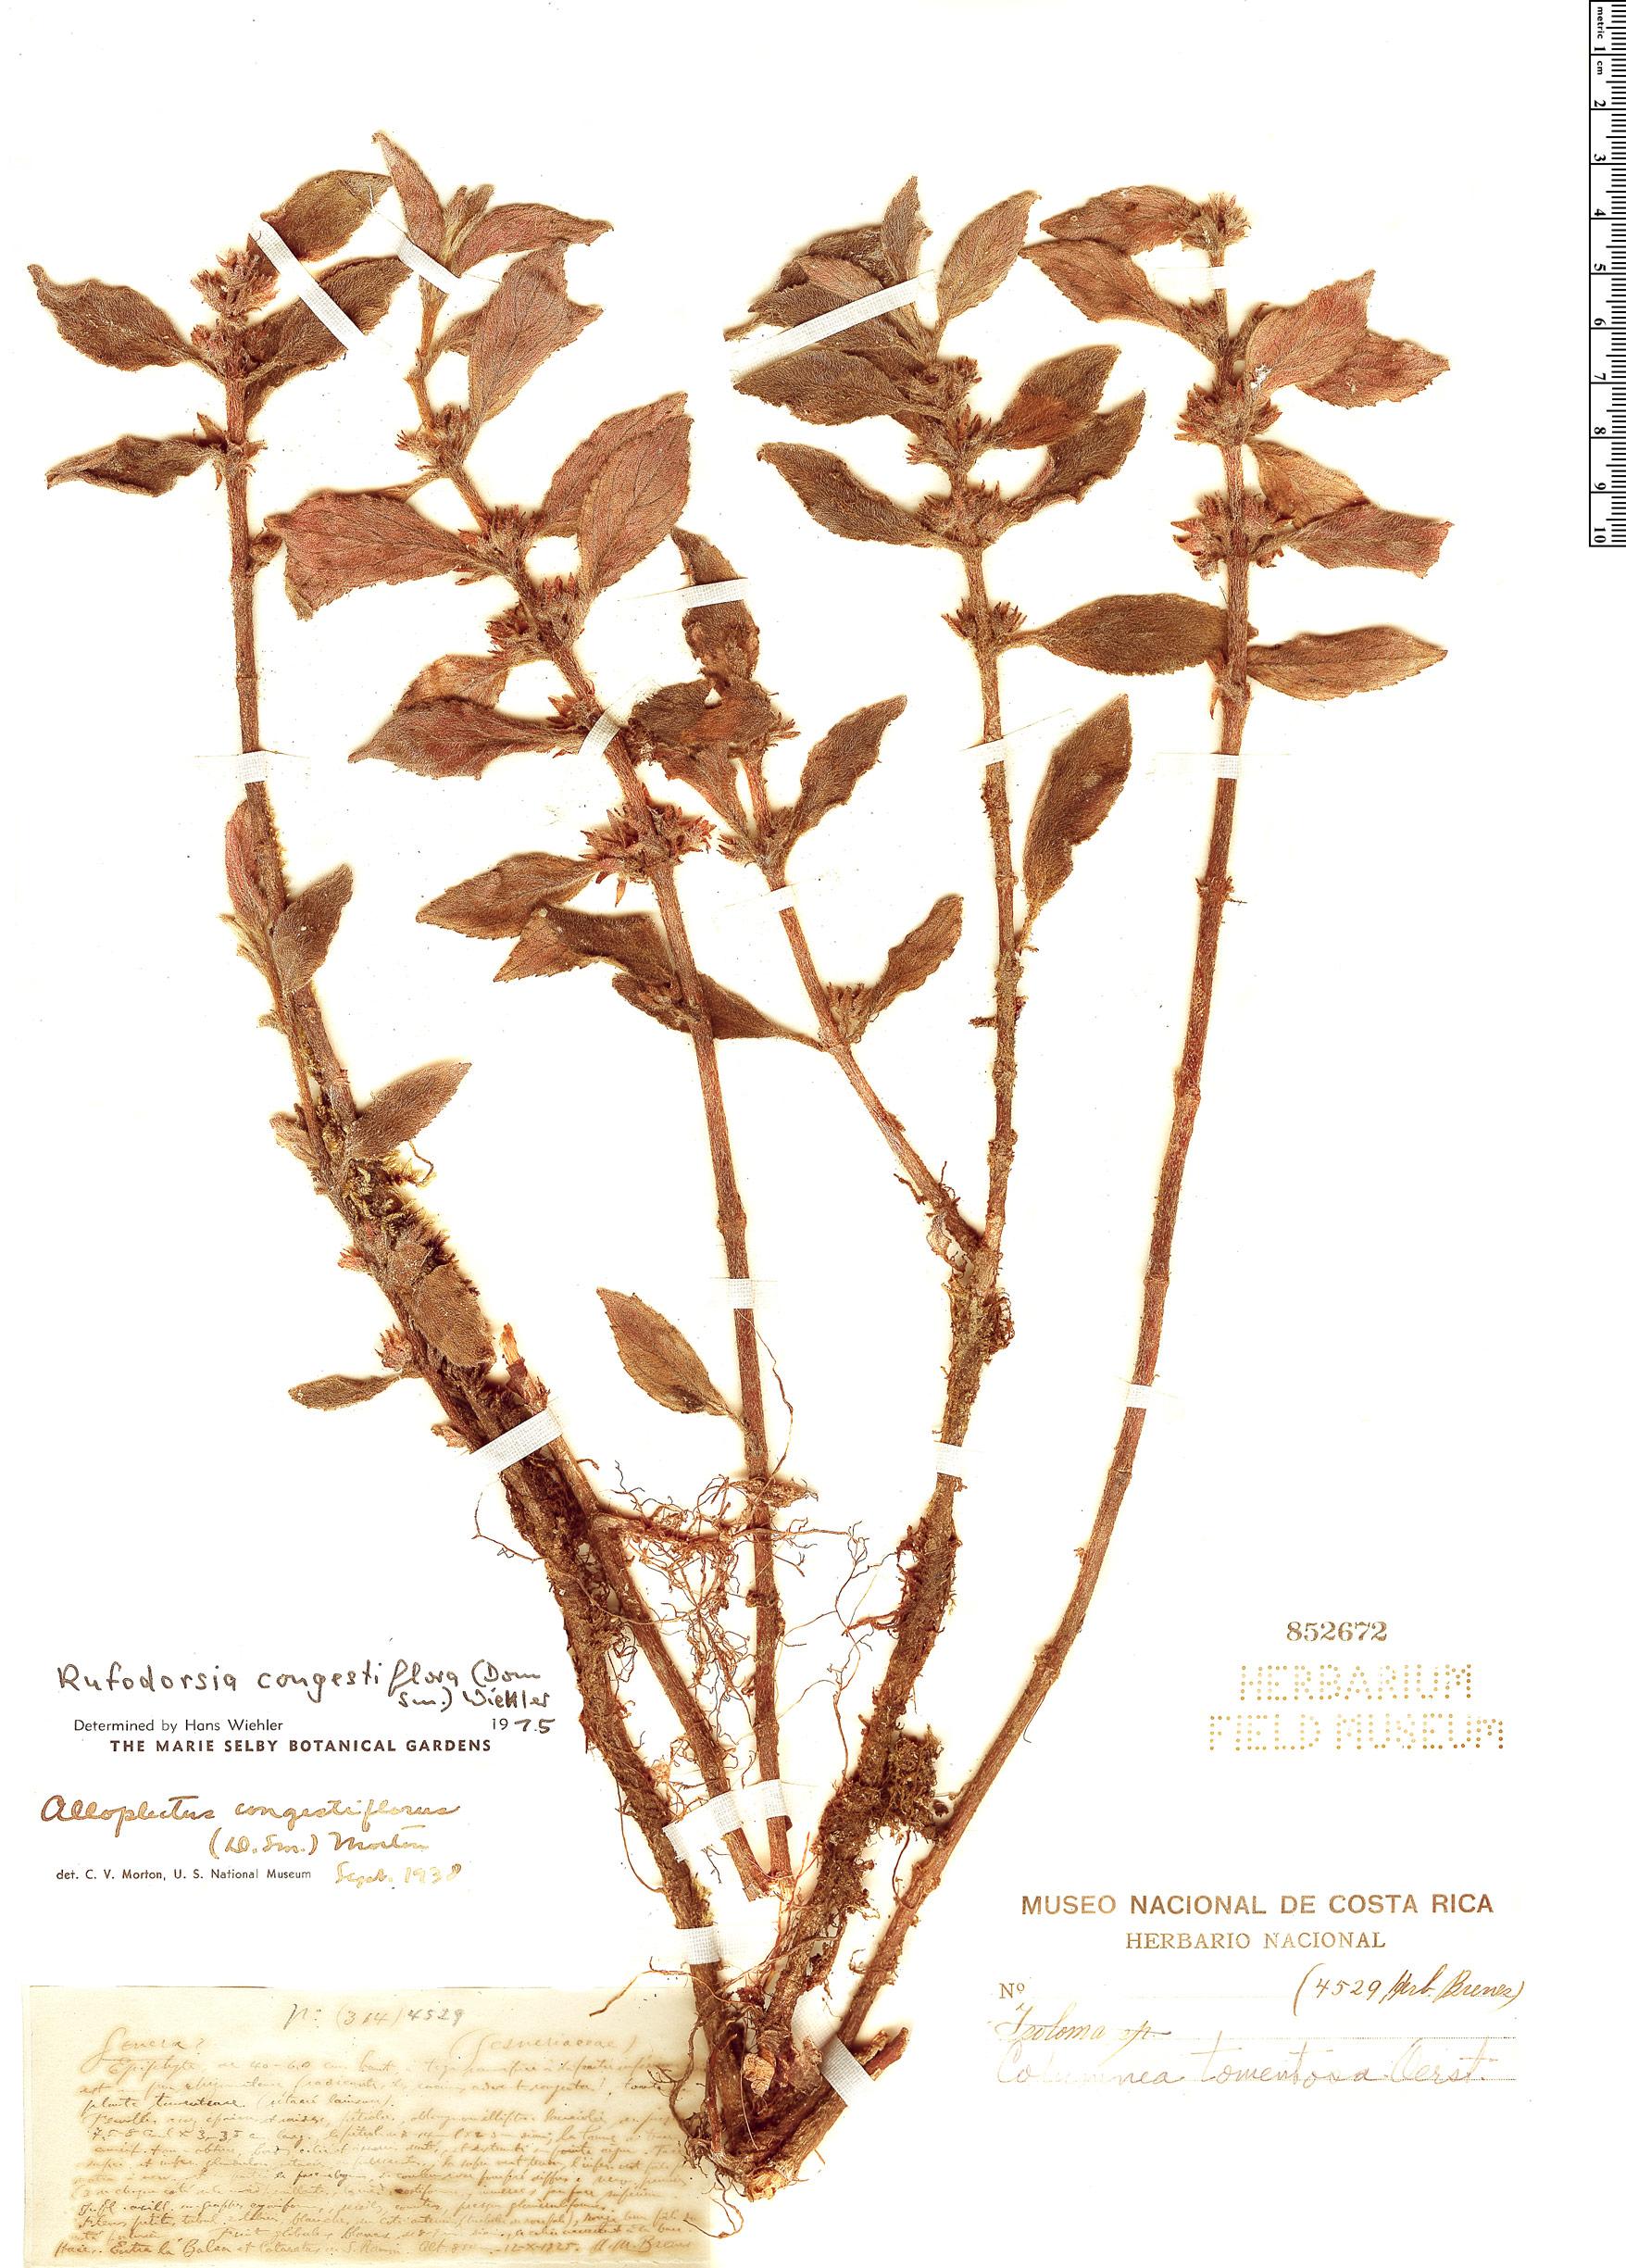 Specimen: Rufodorsia congestiflora